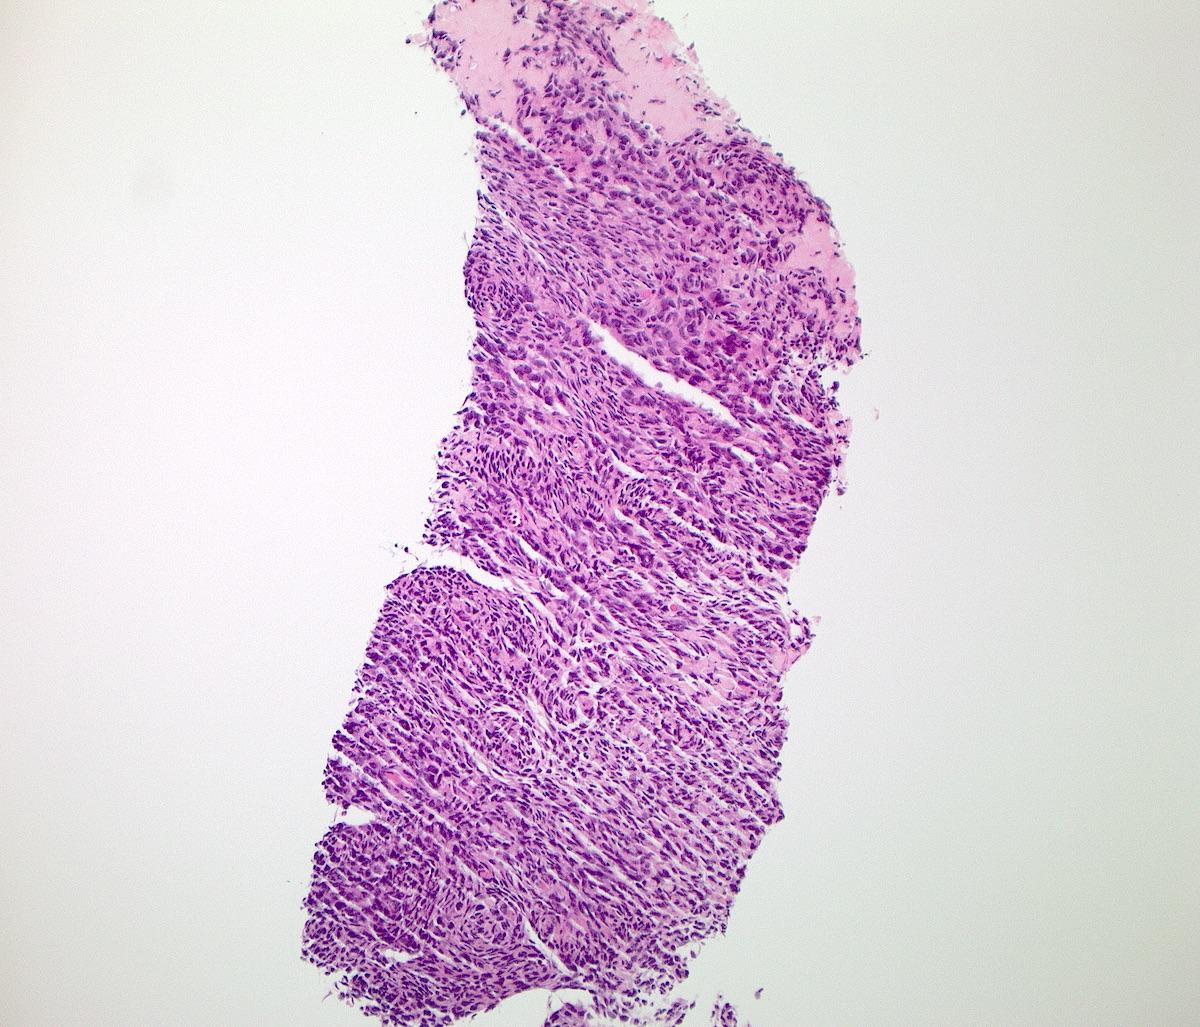 H&E biopsy